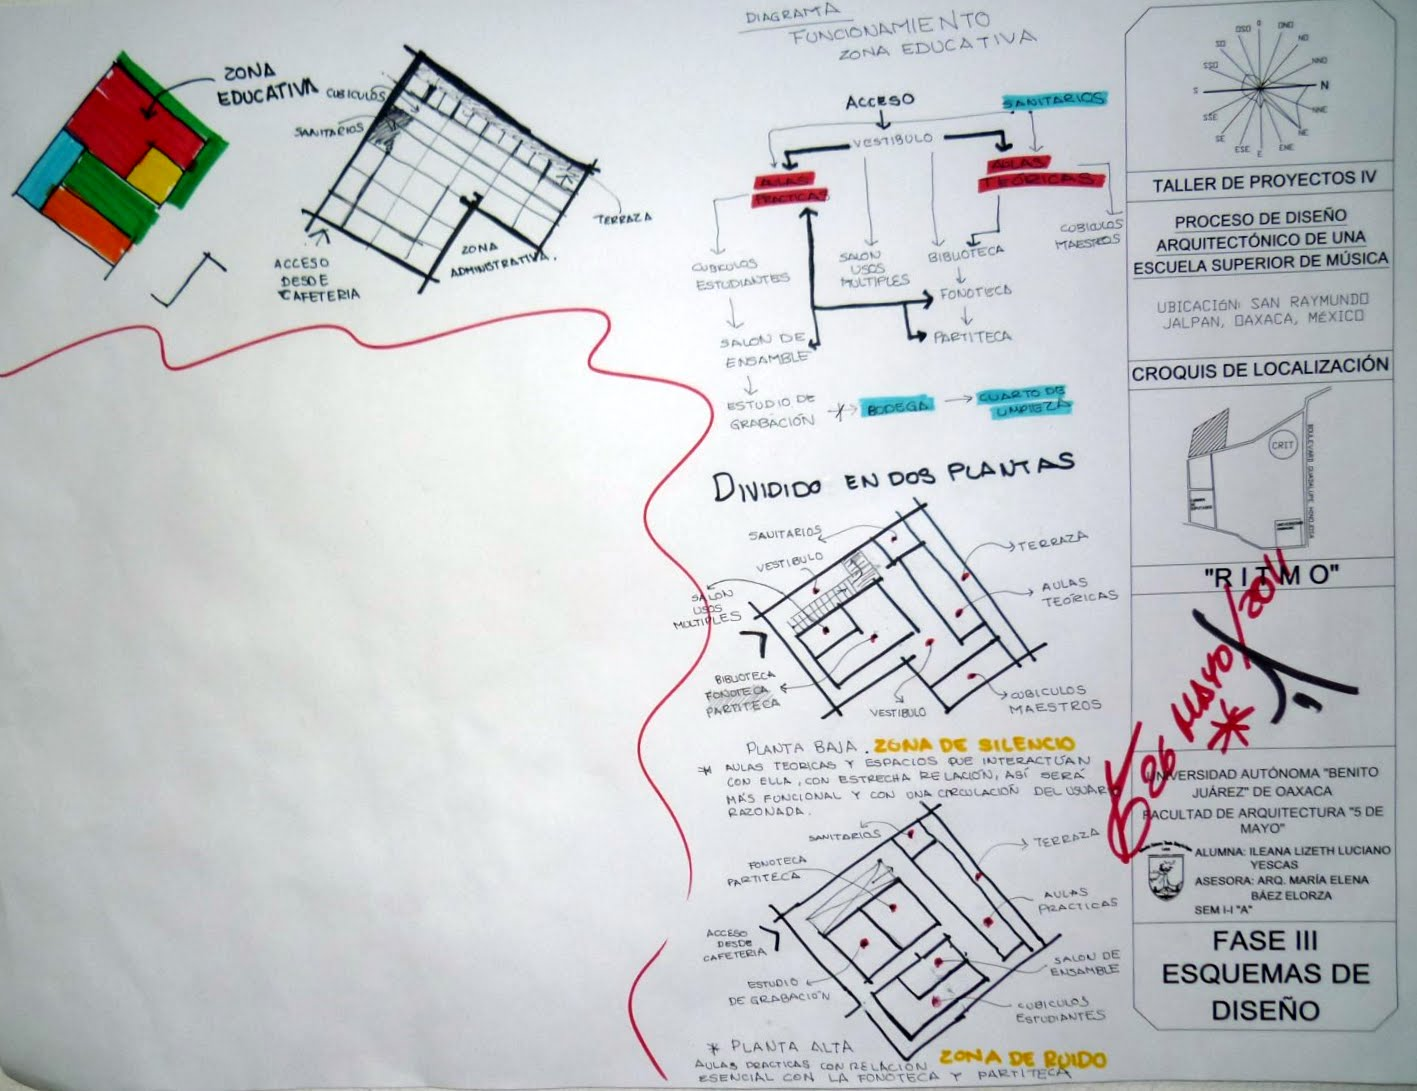 Fases De Dise O Esquema De Planta Arquitect Nica De La